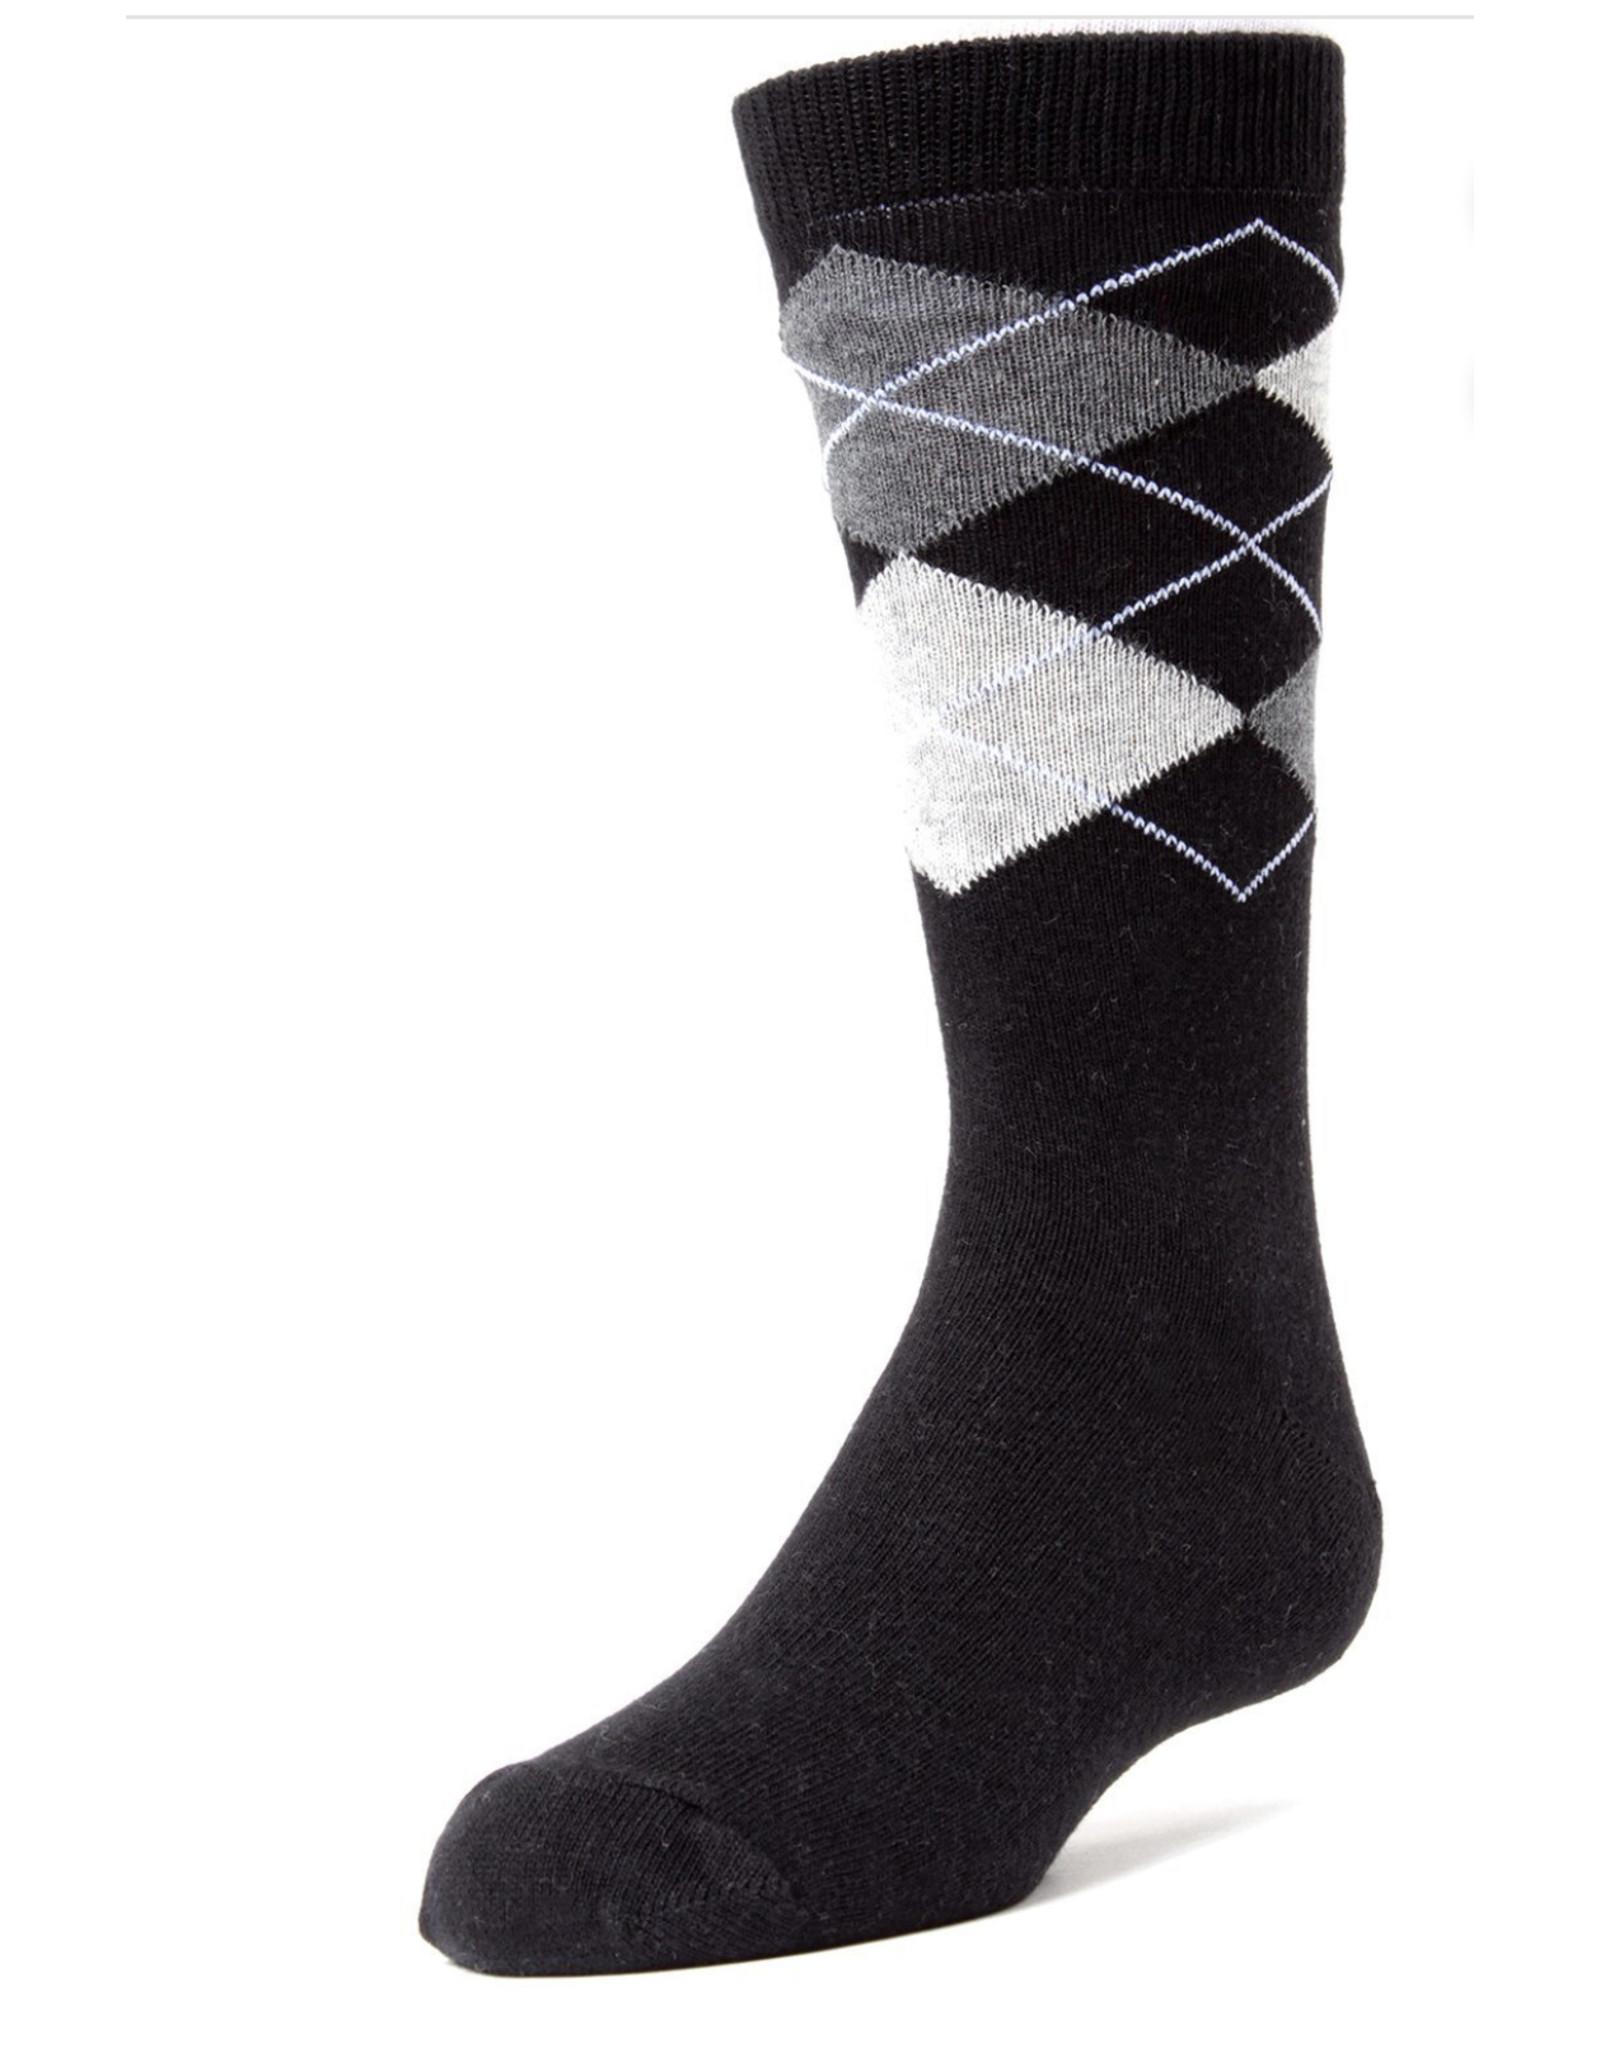 Memoi Memoi Boys Argyle Dress Socks Mk-132